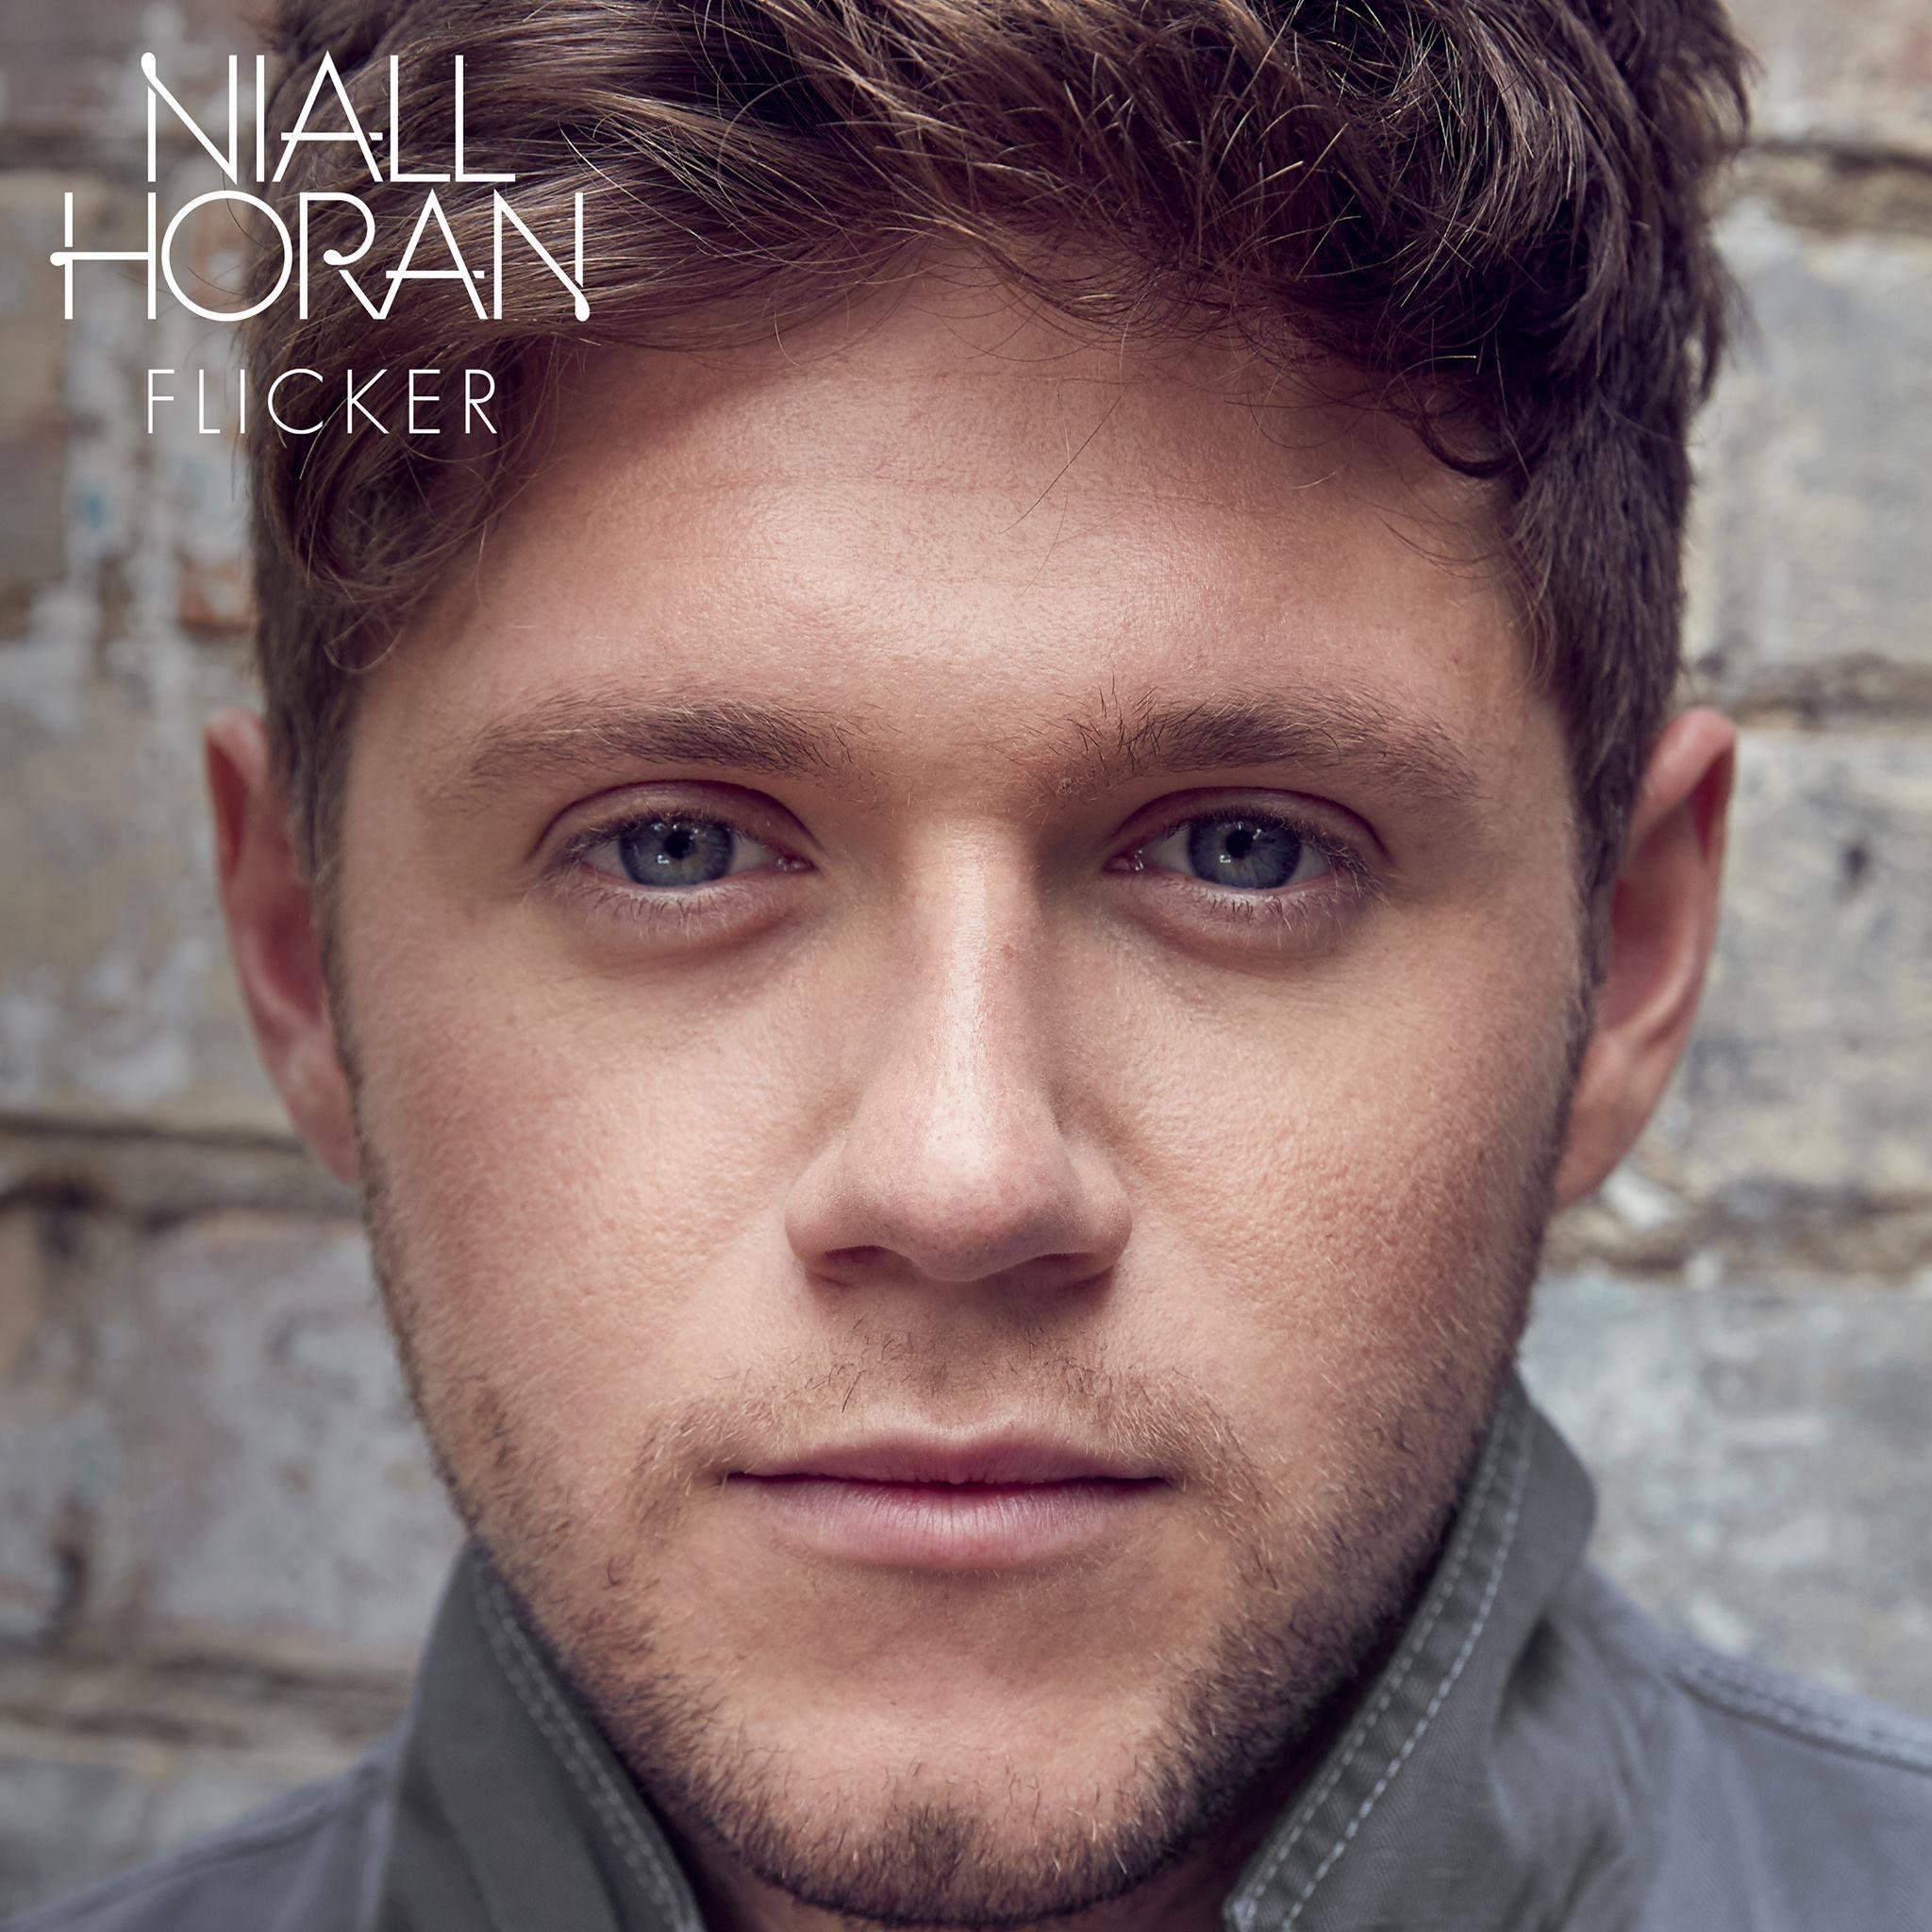 Daly Download Top 30 - October 14, 2017